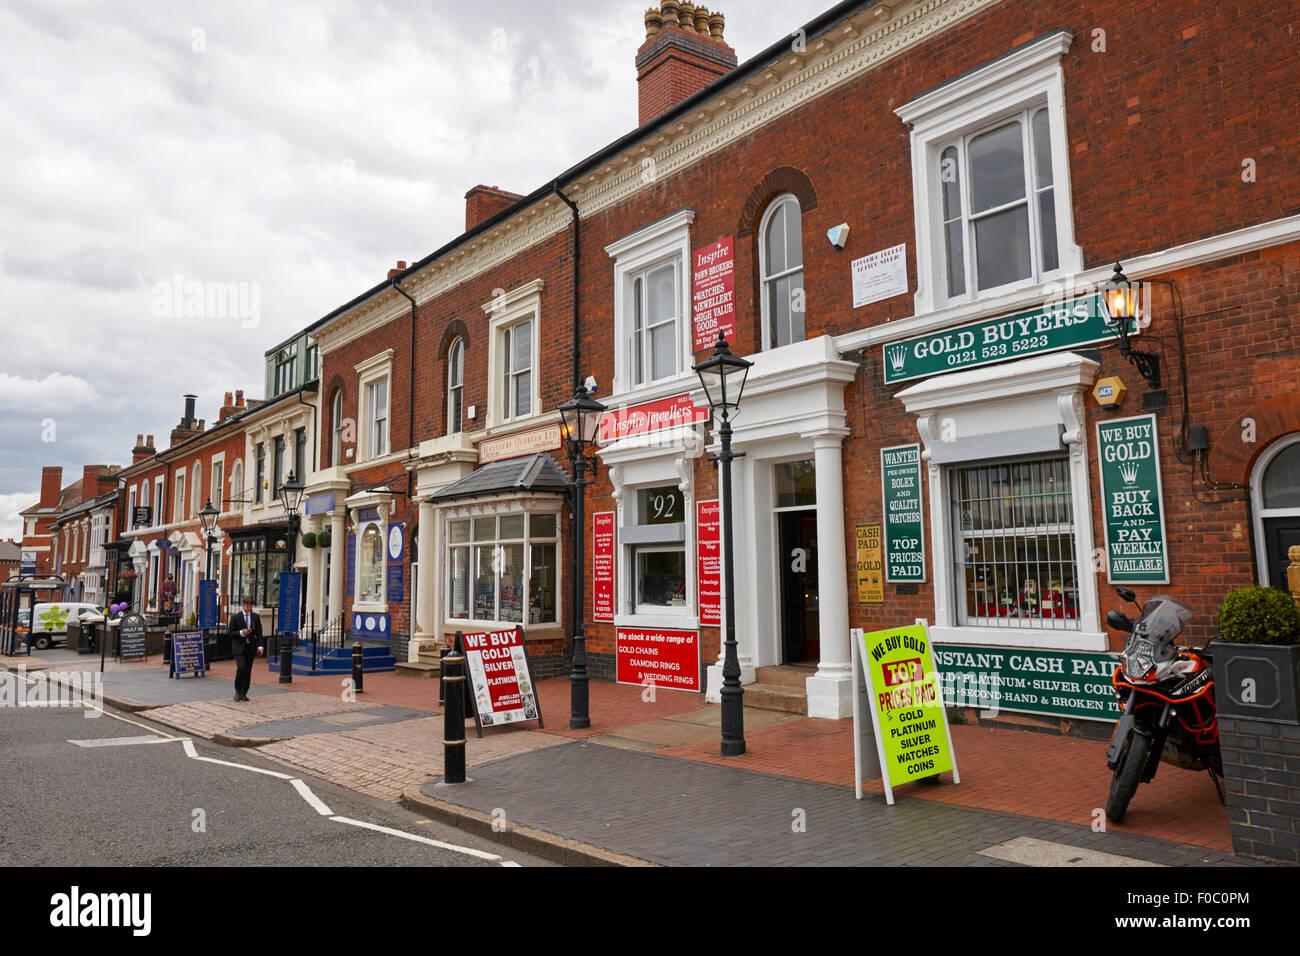 Jewellery Shops On Vyse Street Quarter Birmingham UK